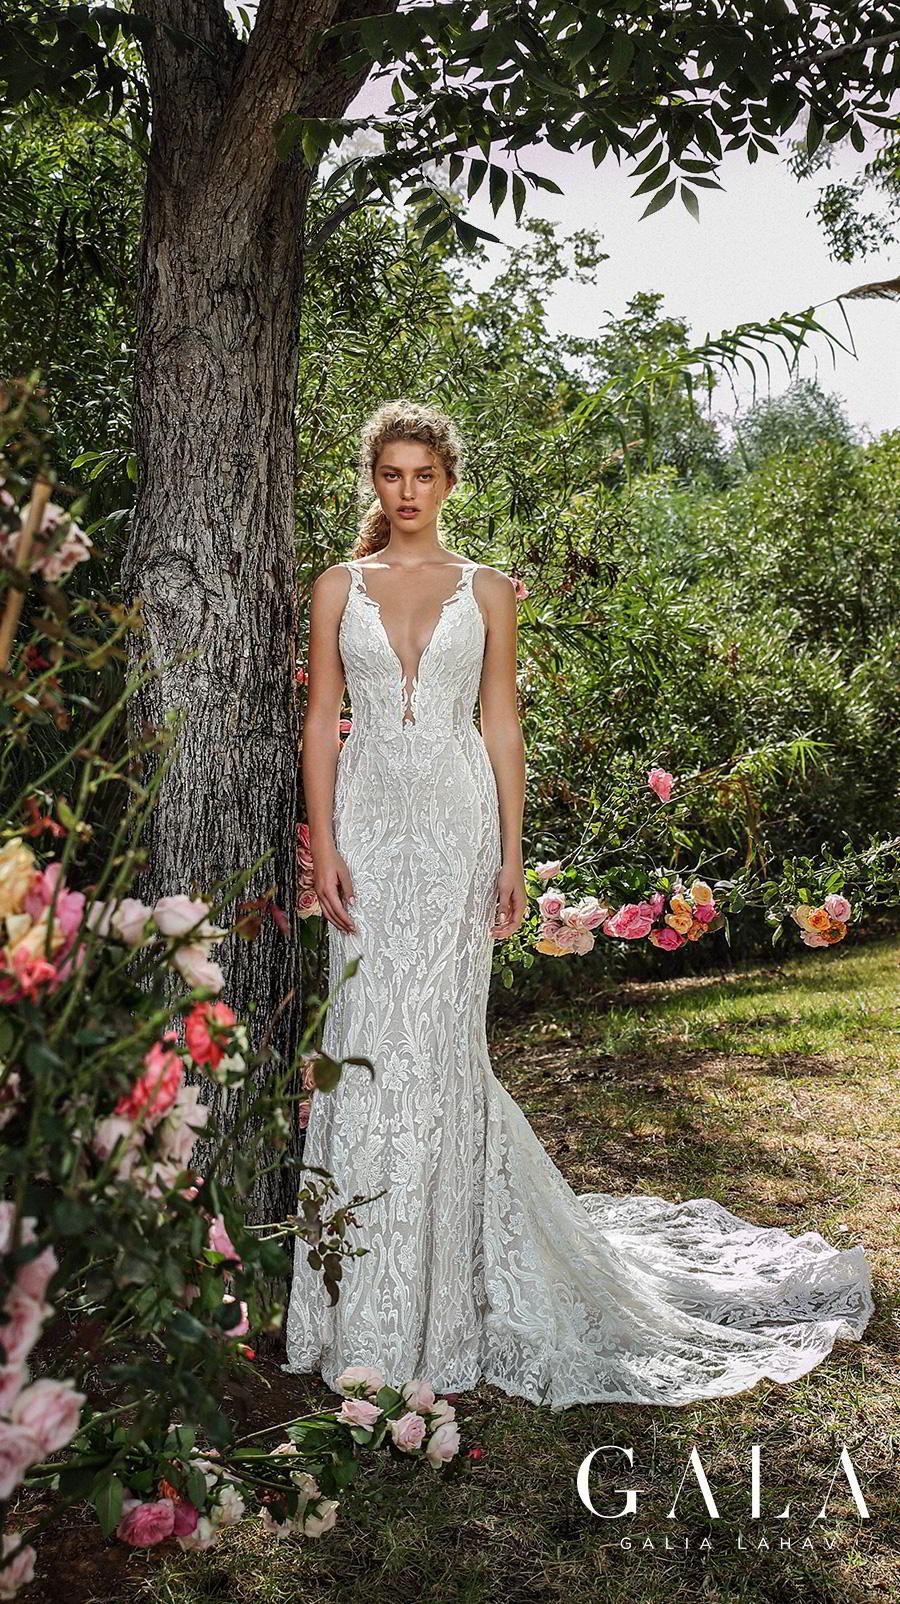 galia lahav gala fall 2019 bridal sleeveless withs trap deep v neck full embellishment elegant lace beautiful sheath wedding dress backless low back chapel train (207) mv